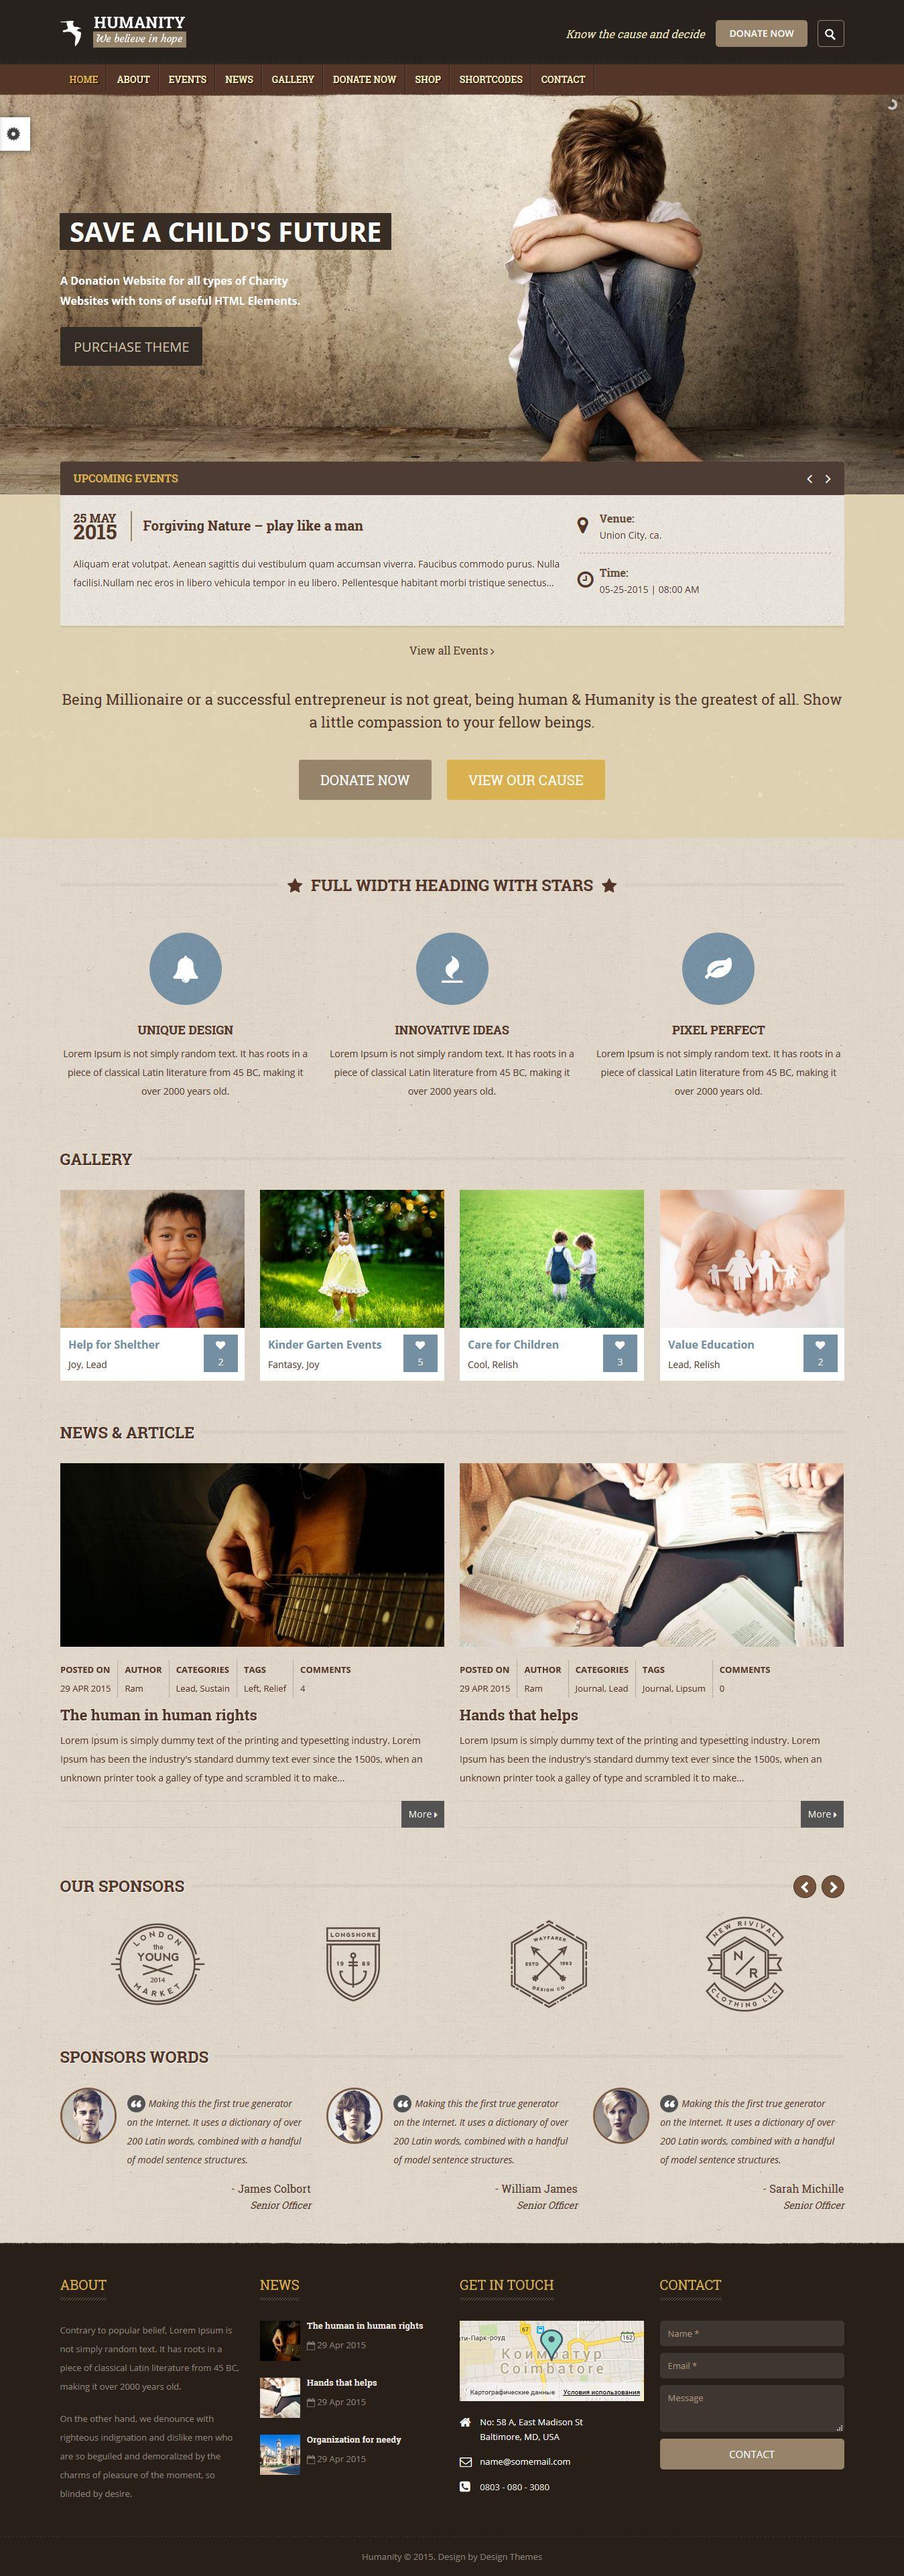 Humanity | NGO & Charity WordPress Theme #webdesign #website Download: http://themeforest.net/item/humanity-ngo-charity-wordpress-theme/12208721?ref=ksioks